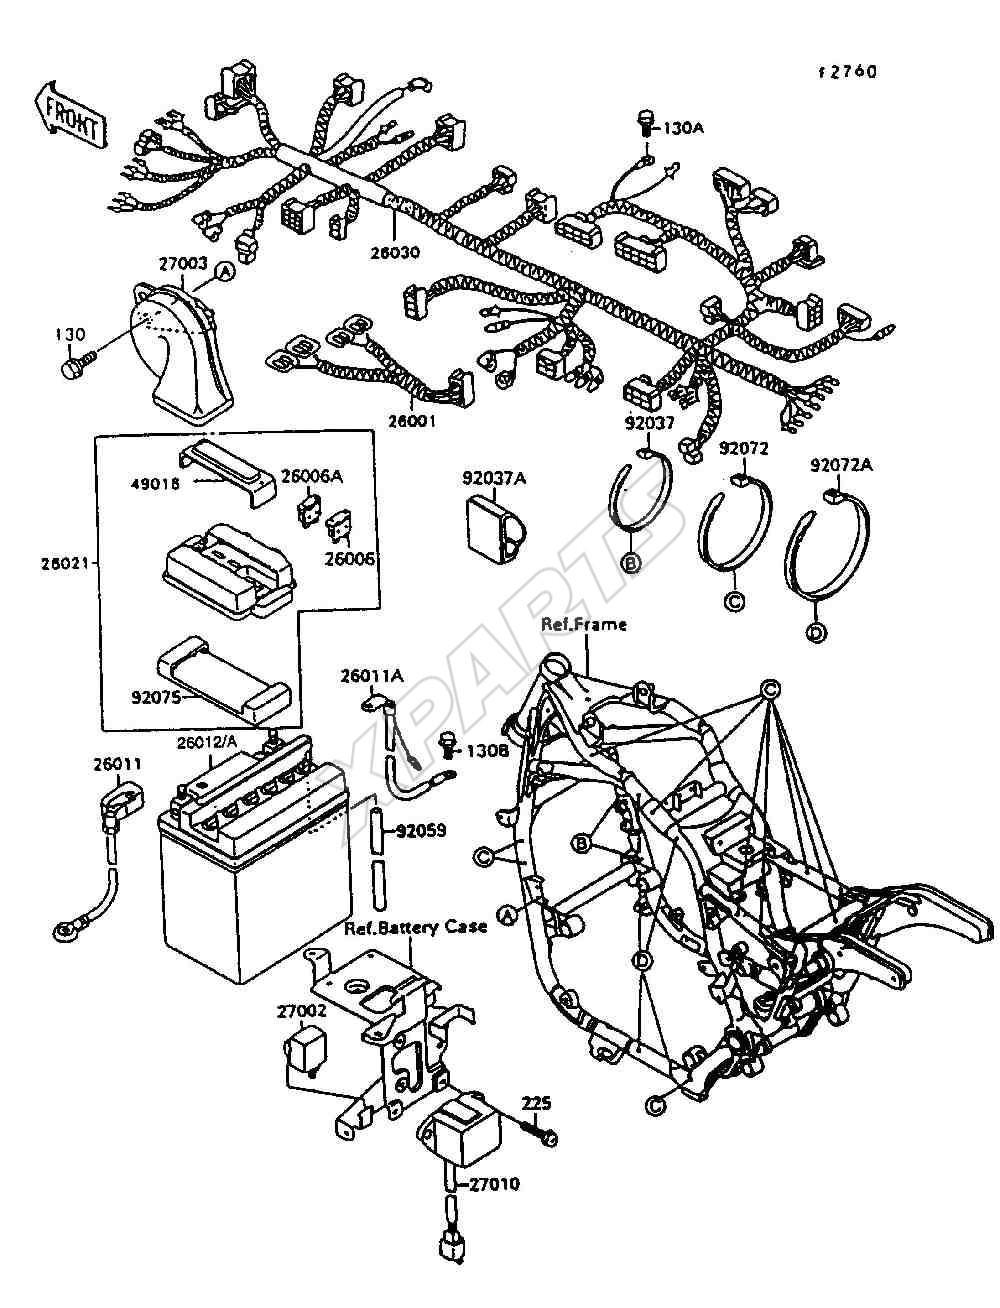 Kawasaki Voyager Xii Wiring Diagram Kawasaki KX65 Wiring